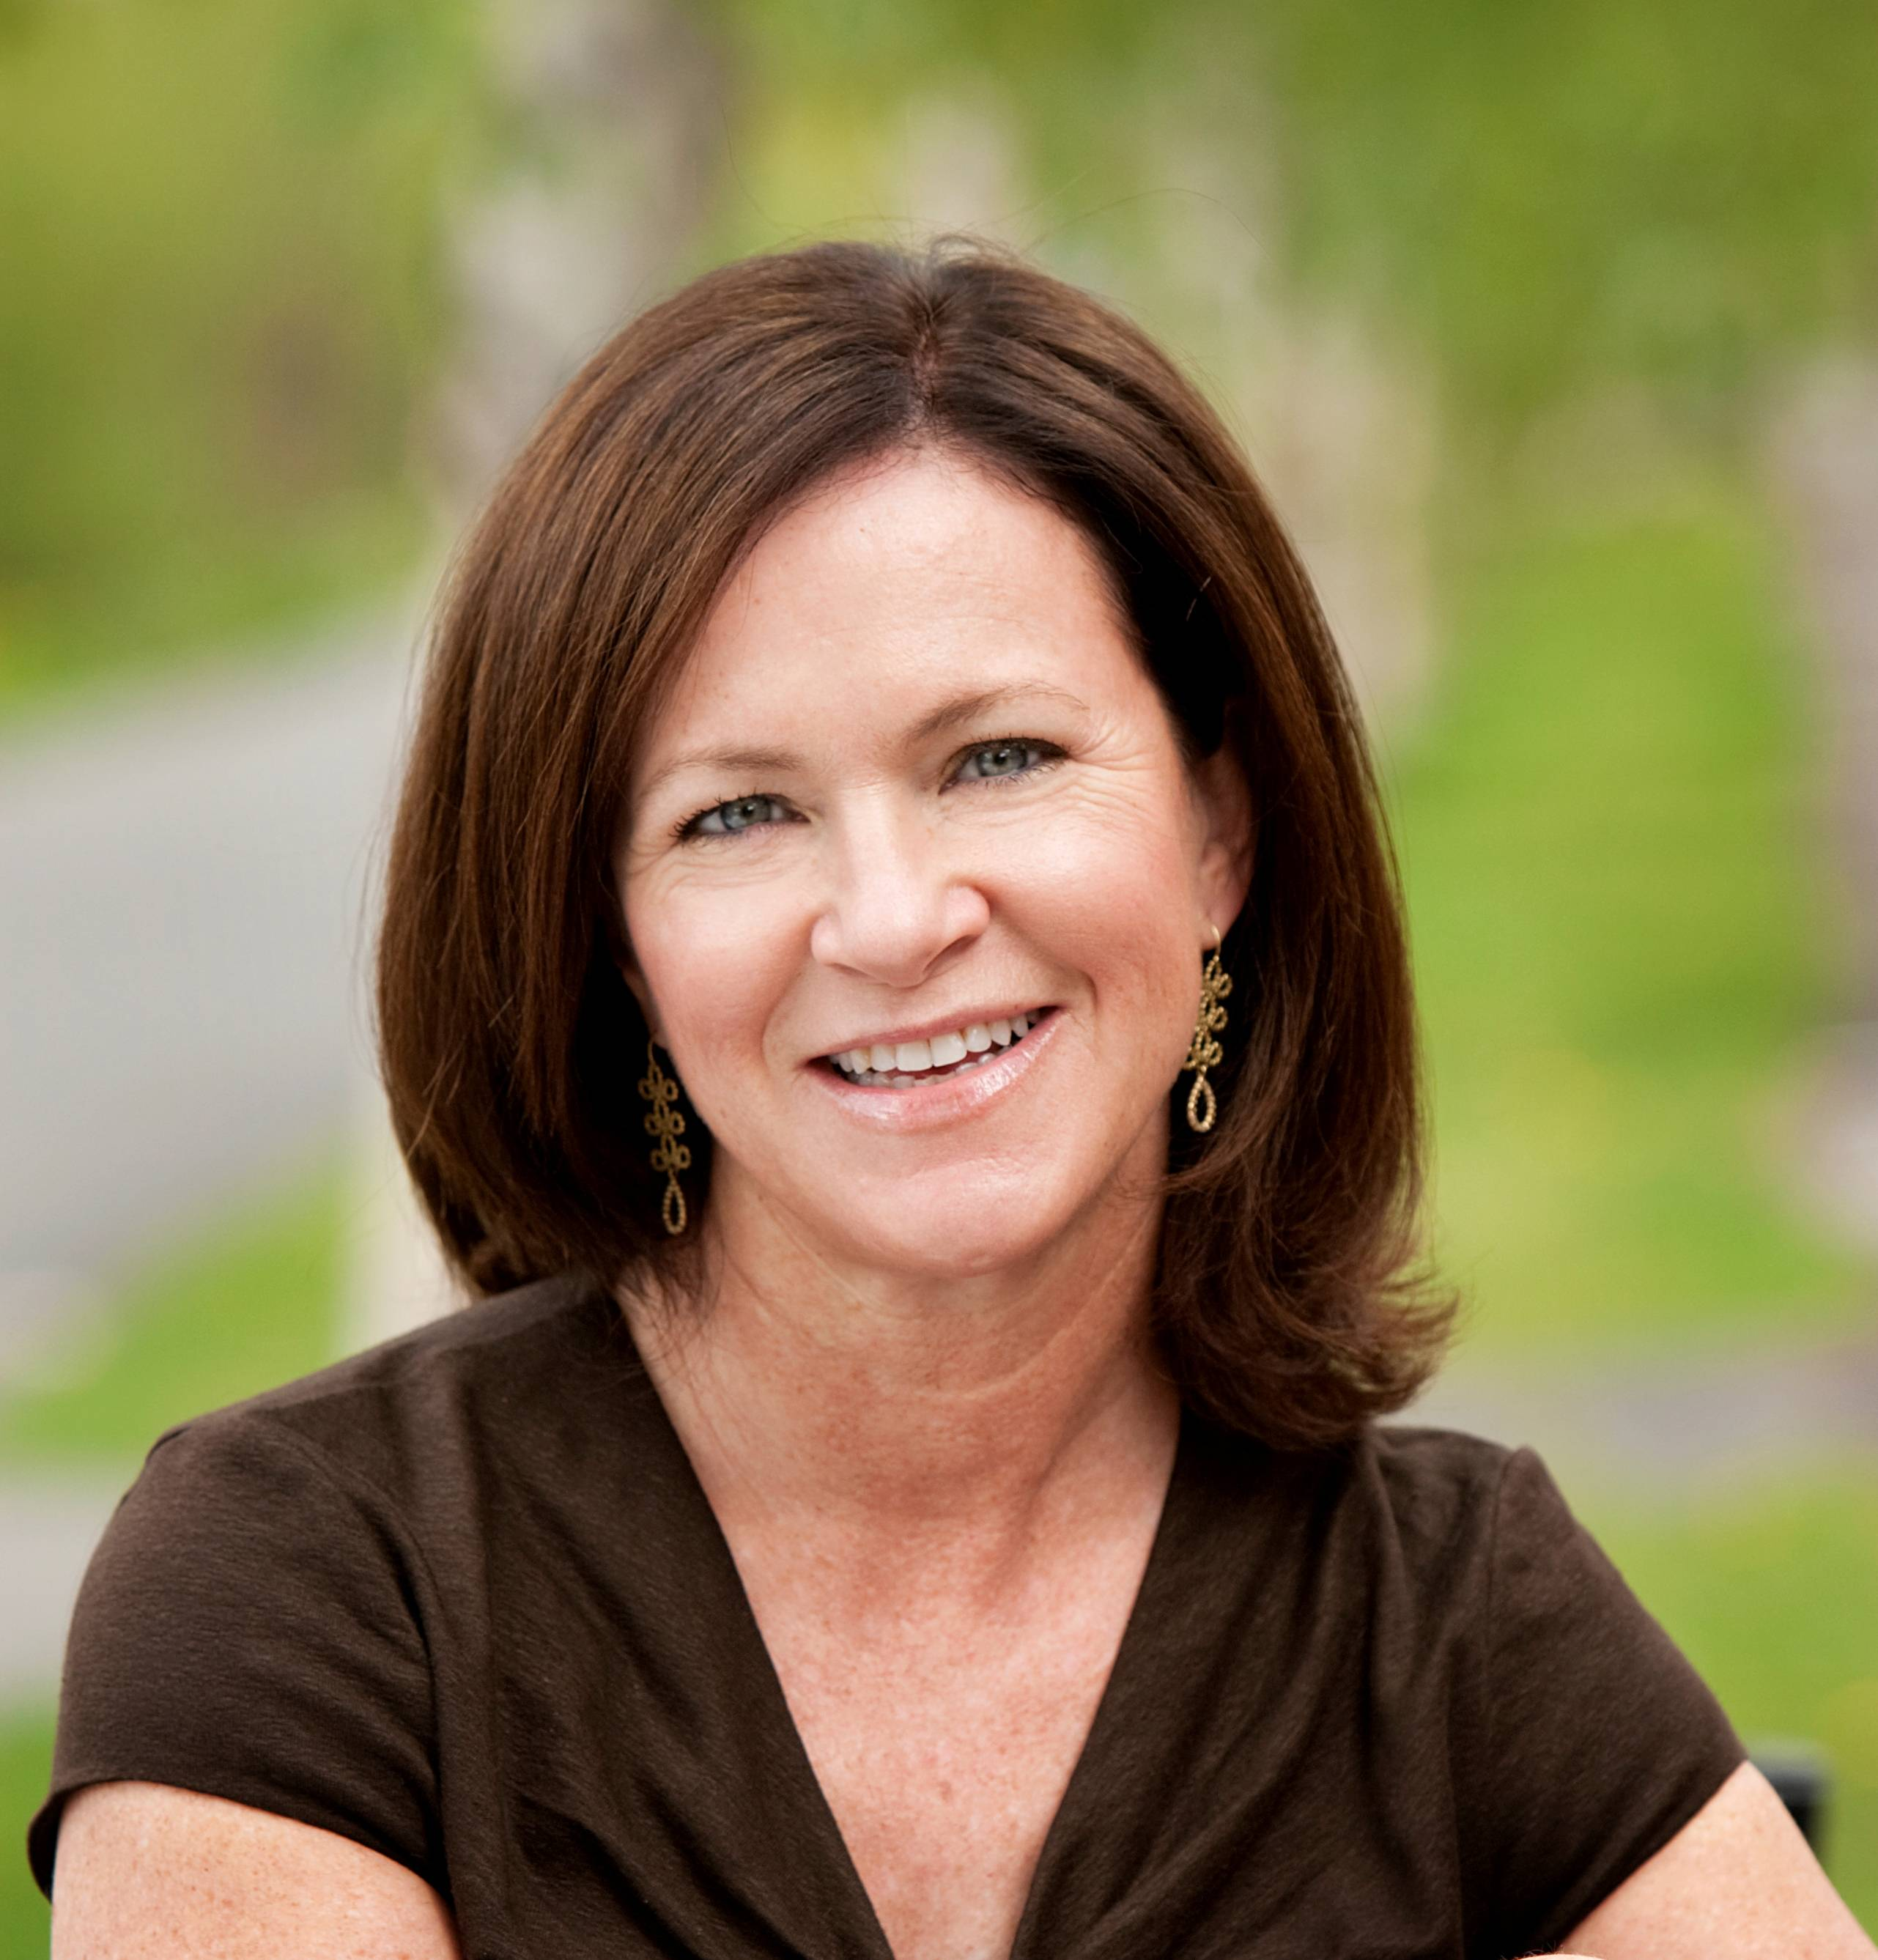 Carol Linton